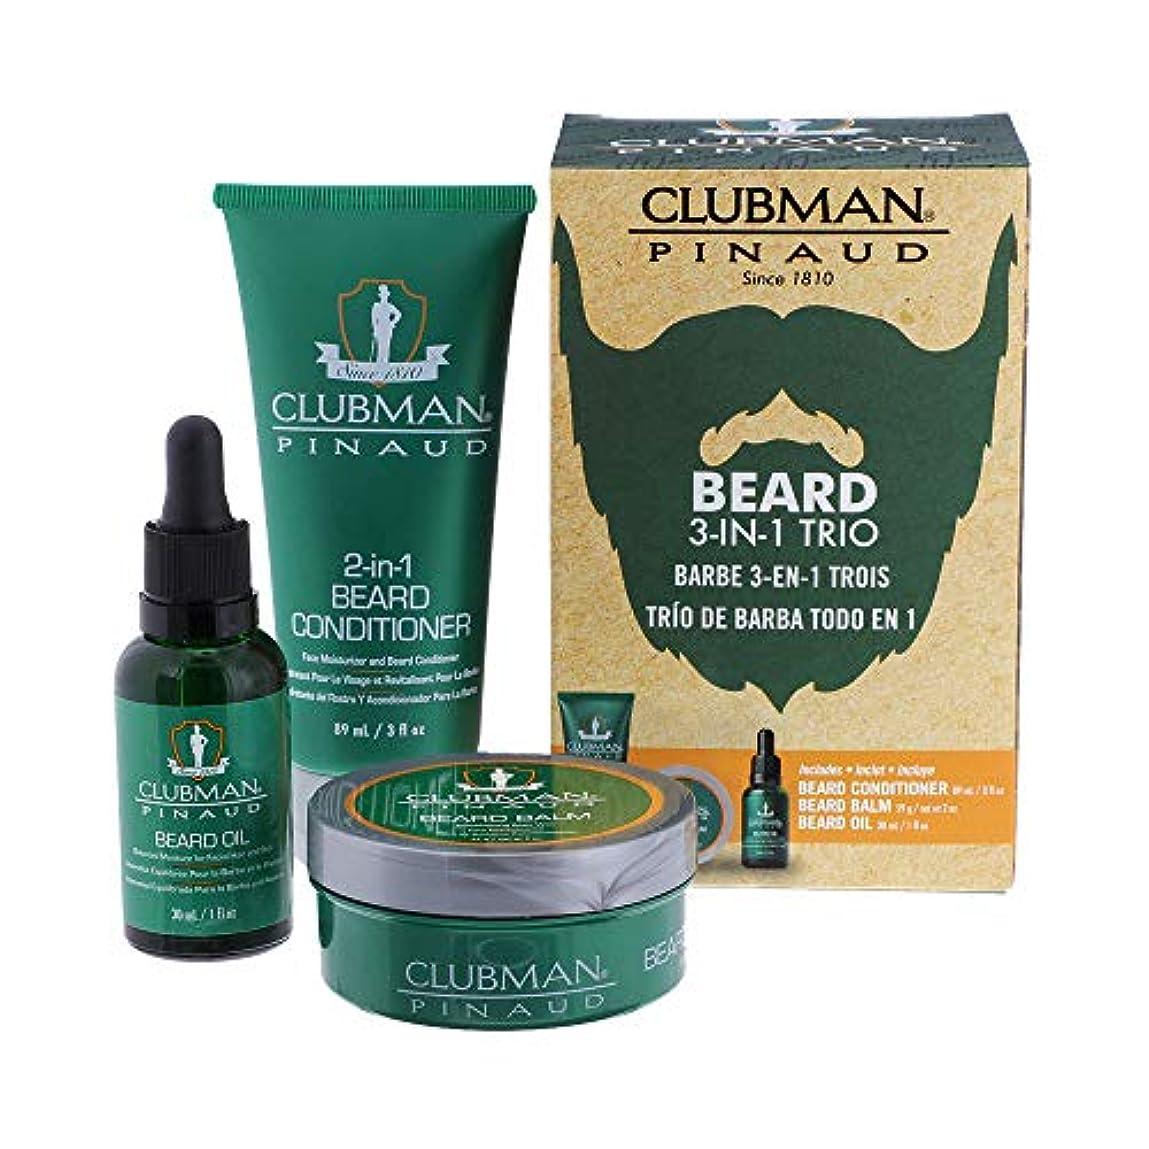 民主主義溝側溝CLUBMAN Beard 3 in 1 Trio - Beard Balm, Oil and 2 in 1 Conditioner (並行輸入品)